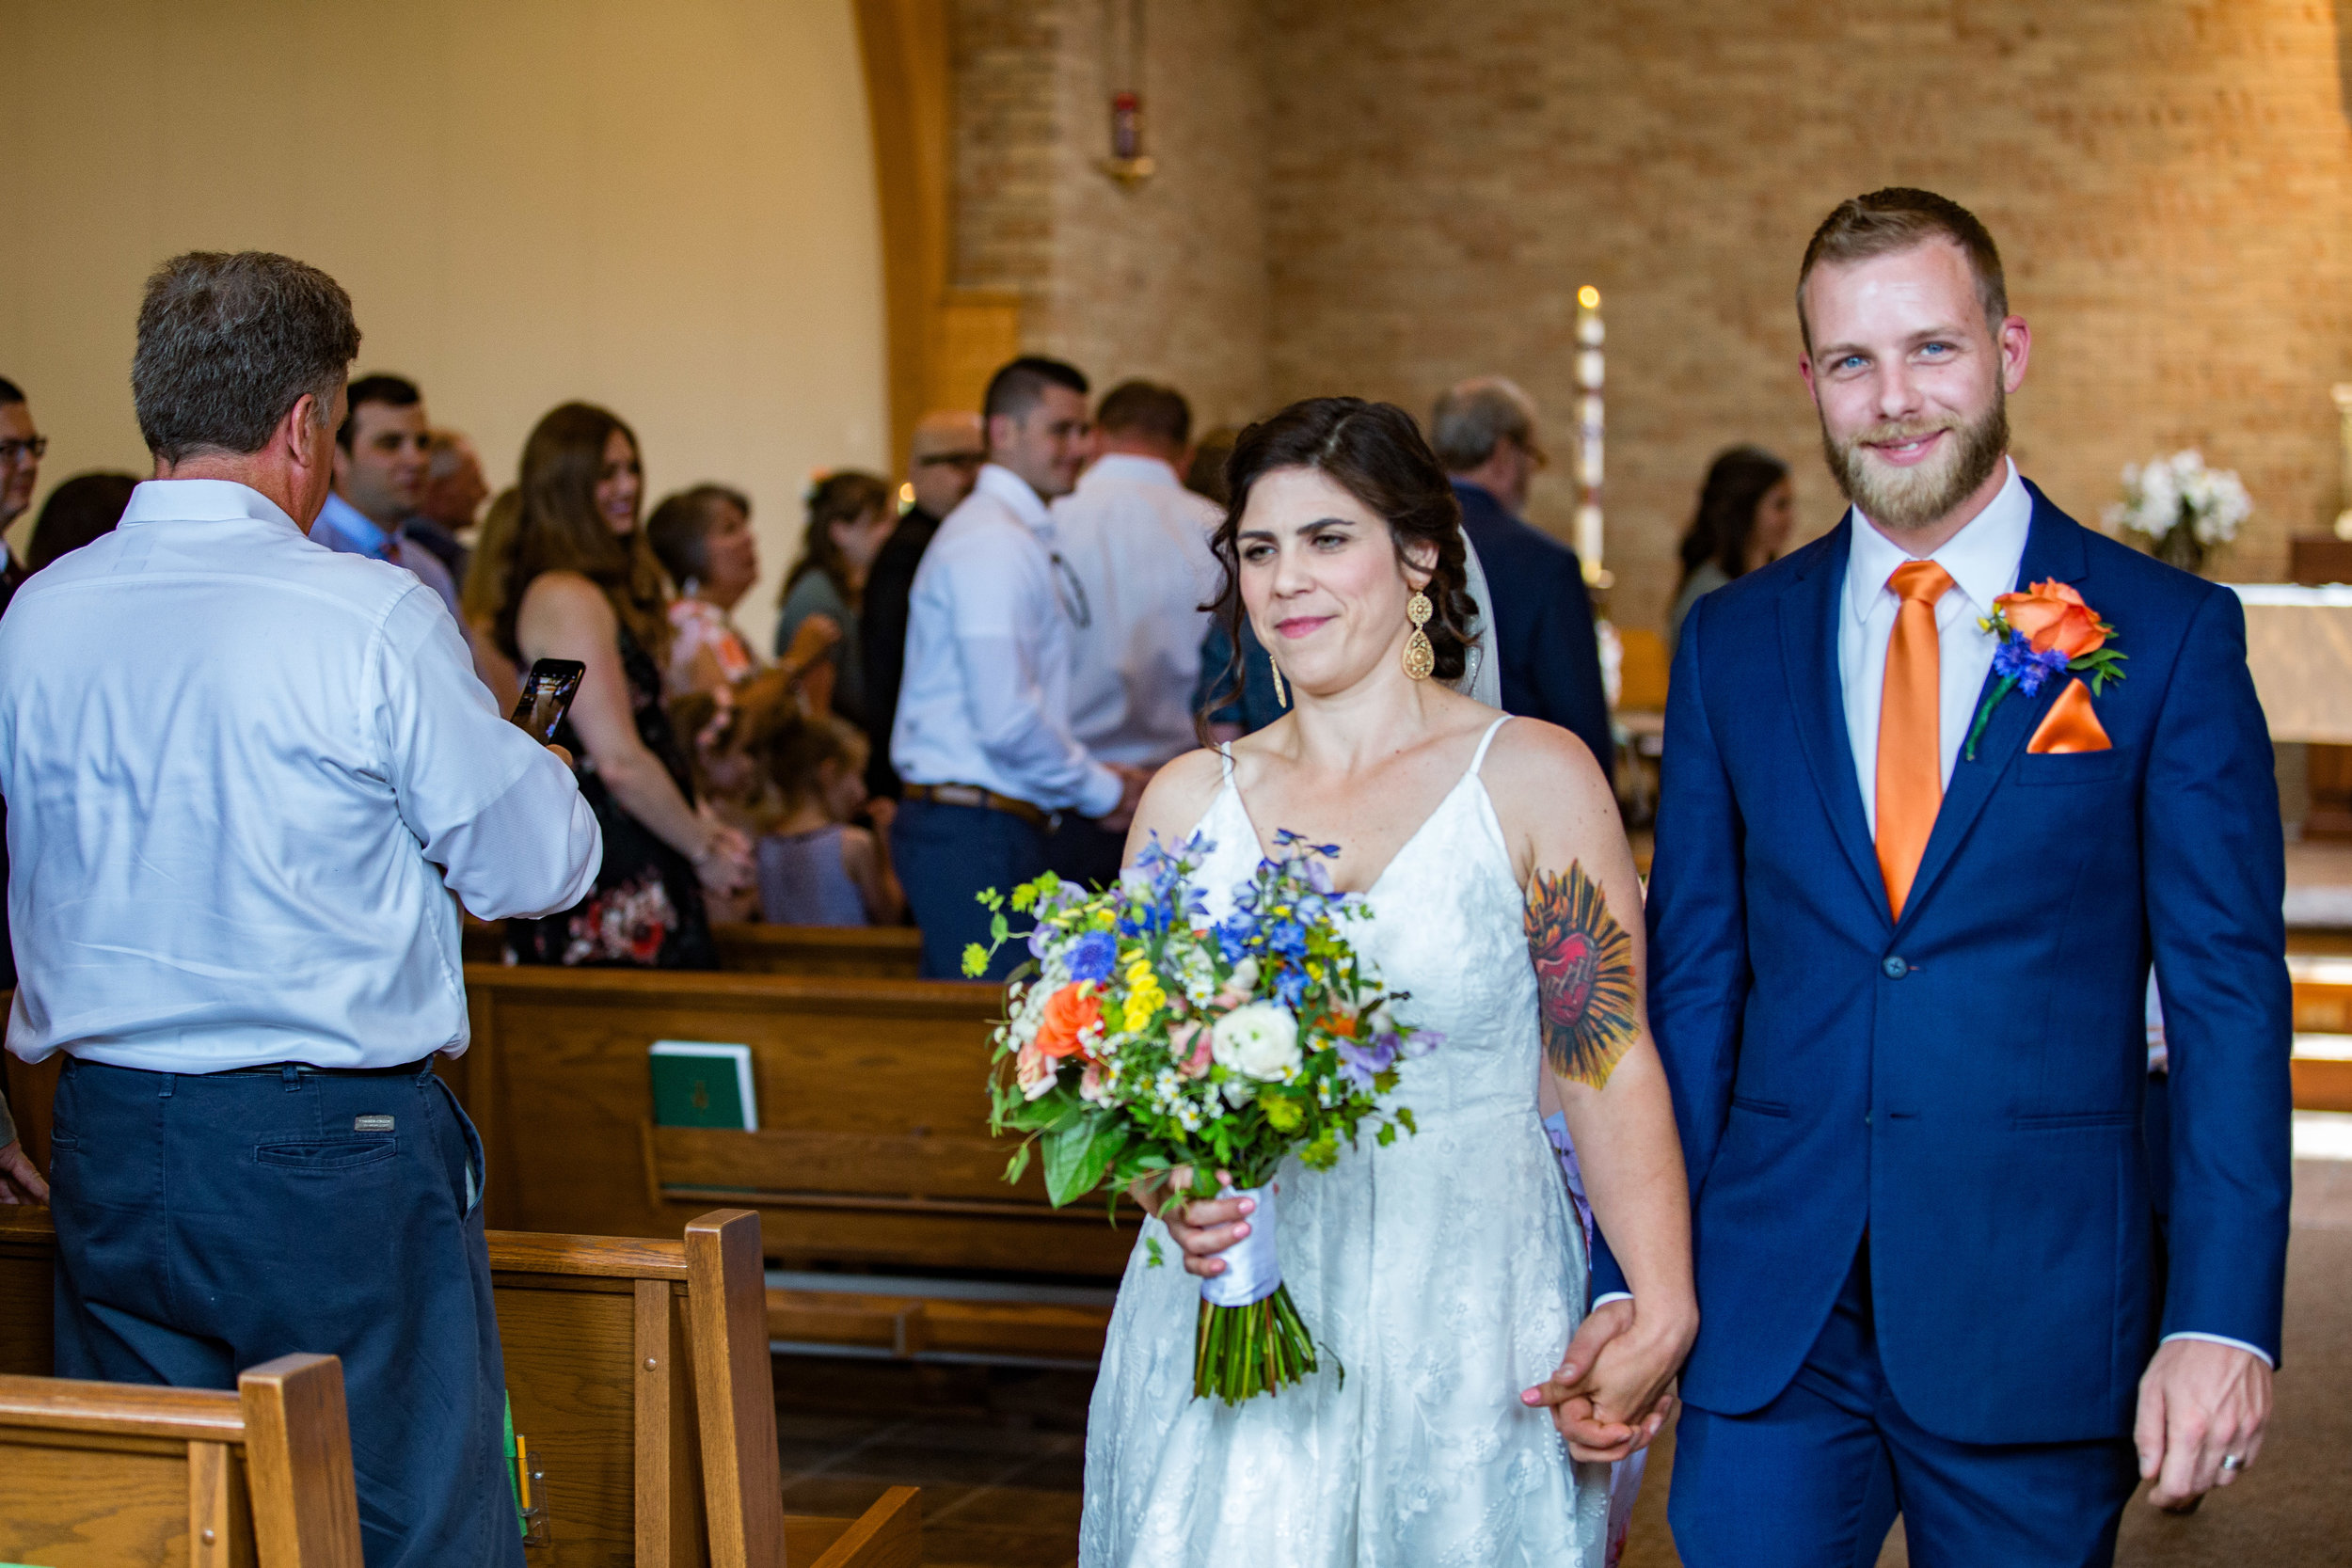 Natalie and Dallas Mooney Wedding 6-8-19_Tania Watt Photography-150.jpg